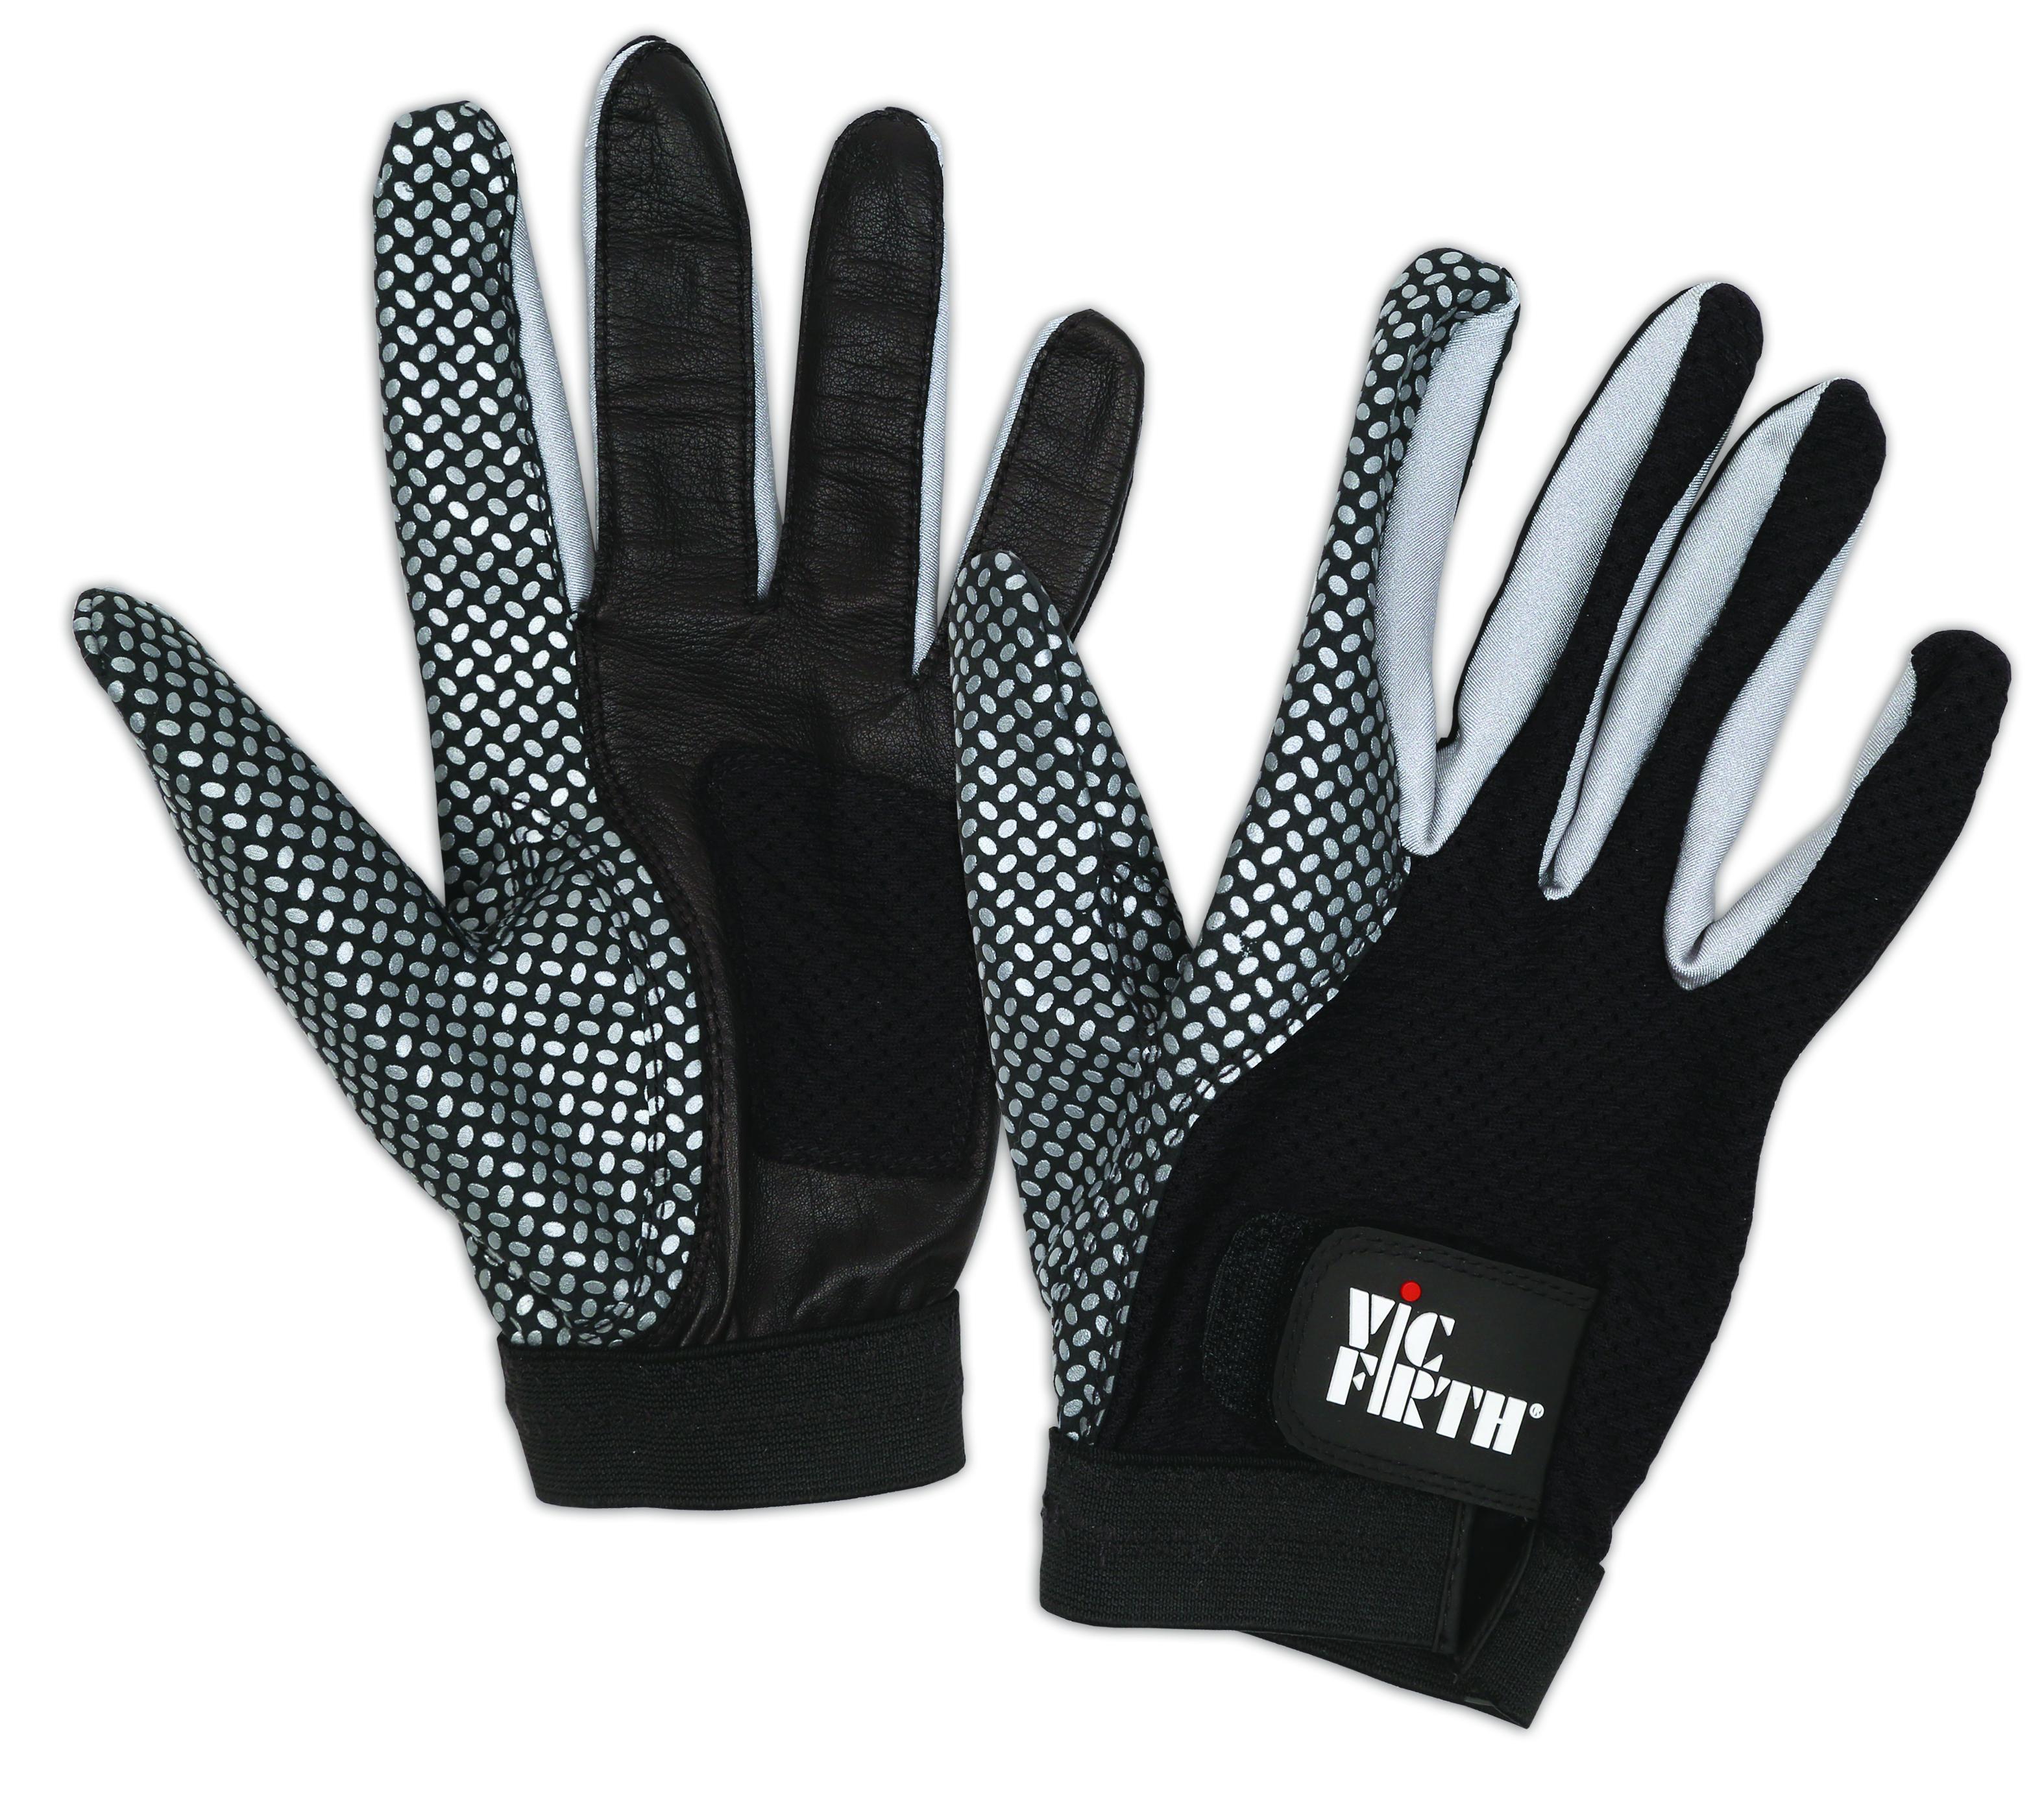 Ventilated Palm Small Vic Firth Drumming Glove Enhanced Grip VICGLVS